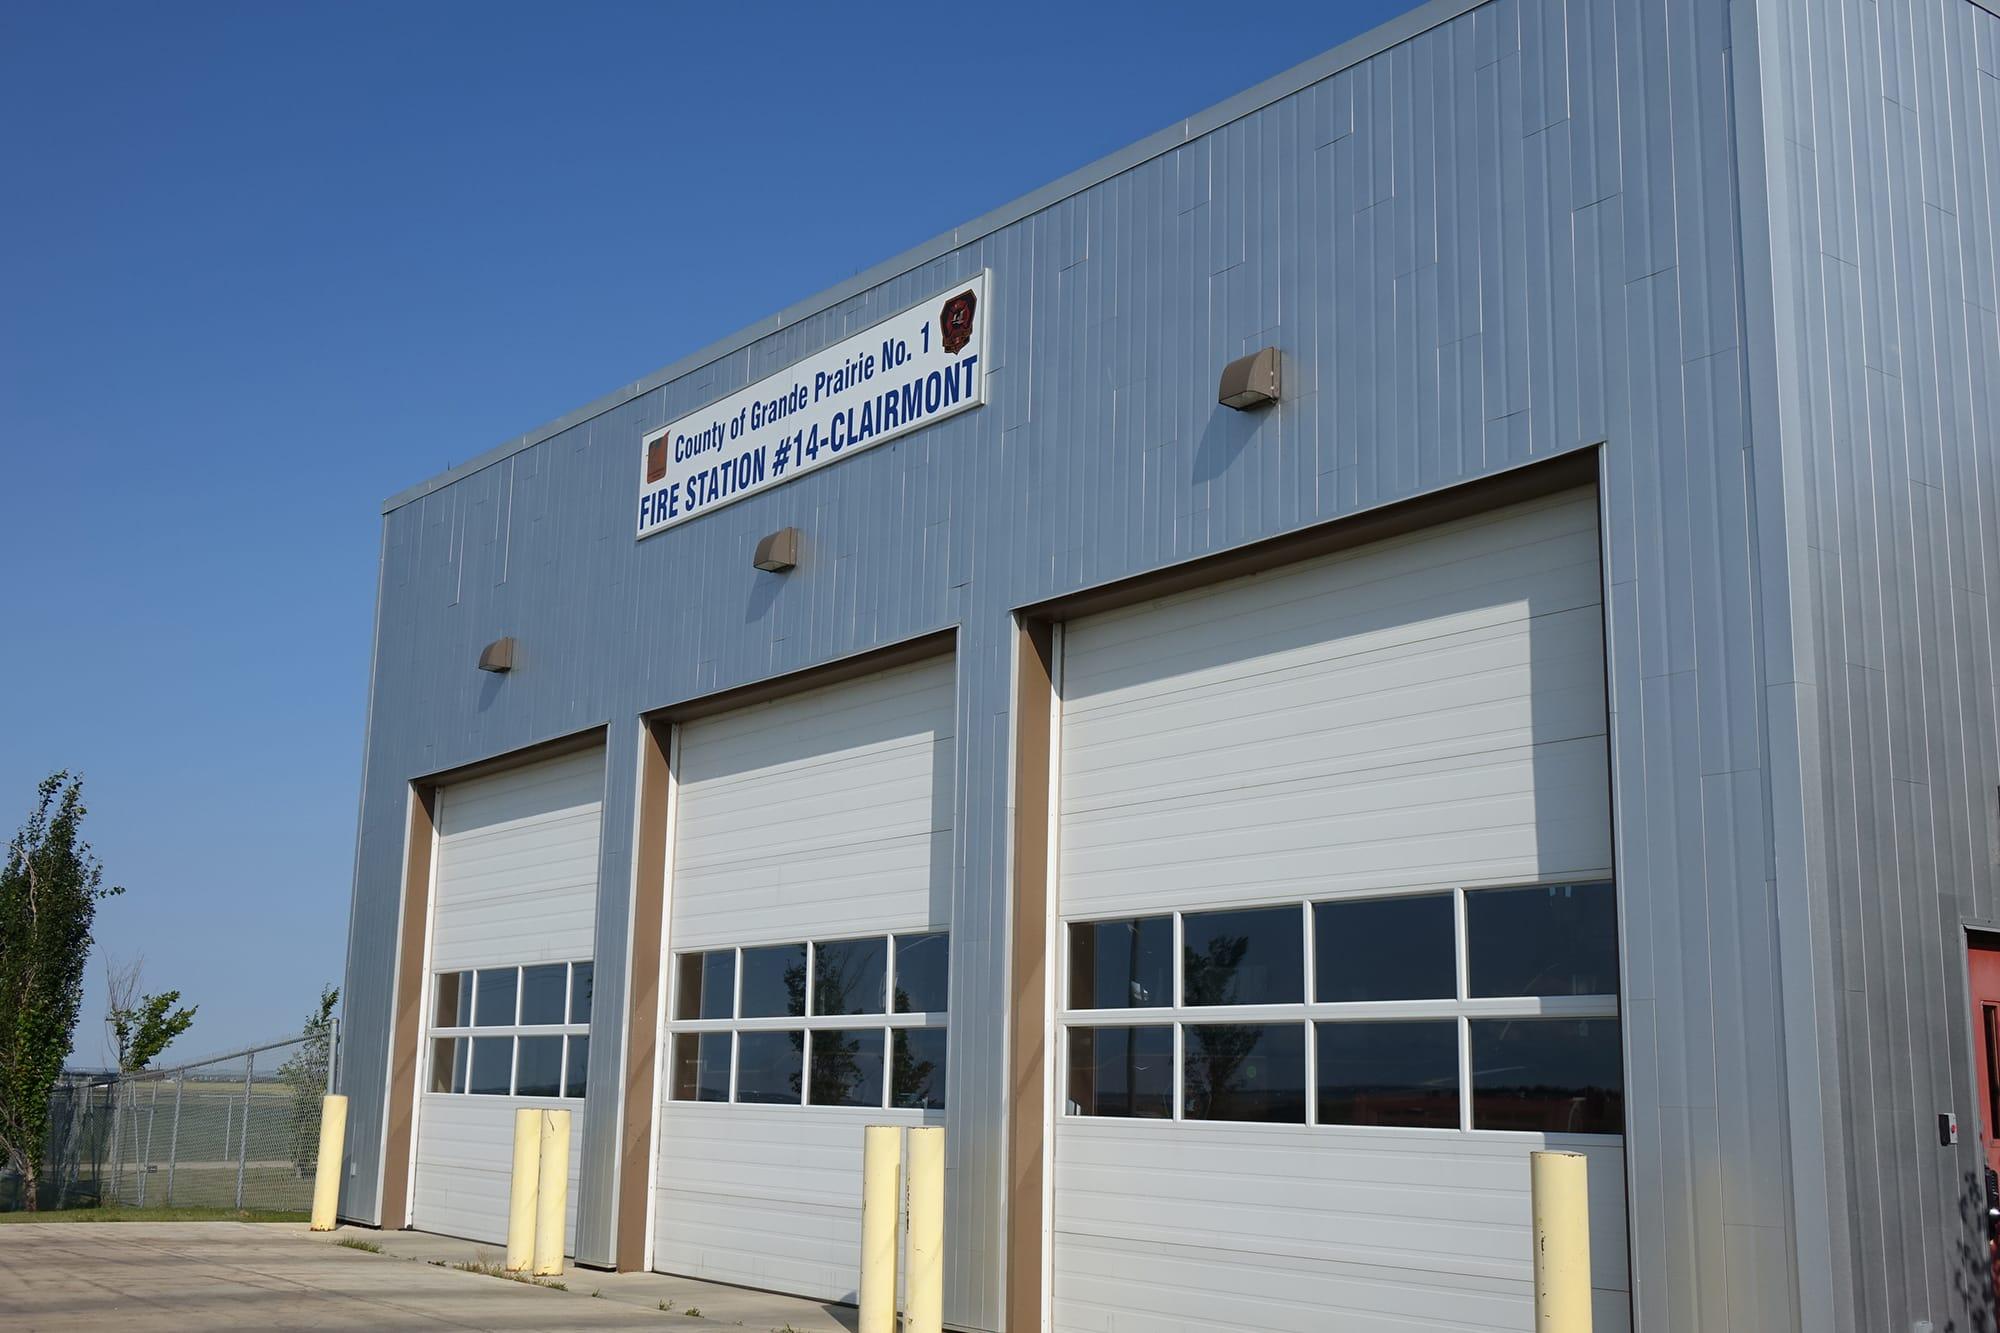 Clairmont Fire Station No14 exterior bays